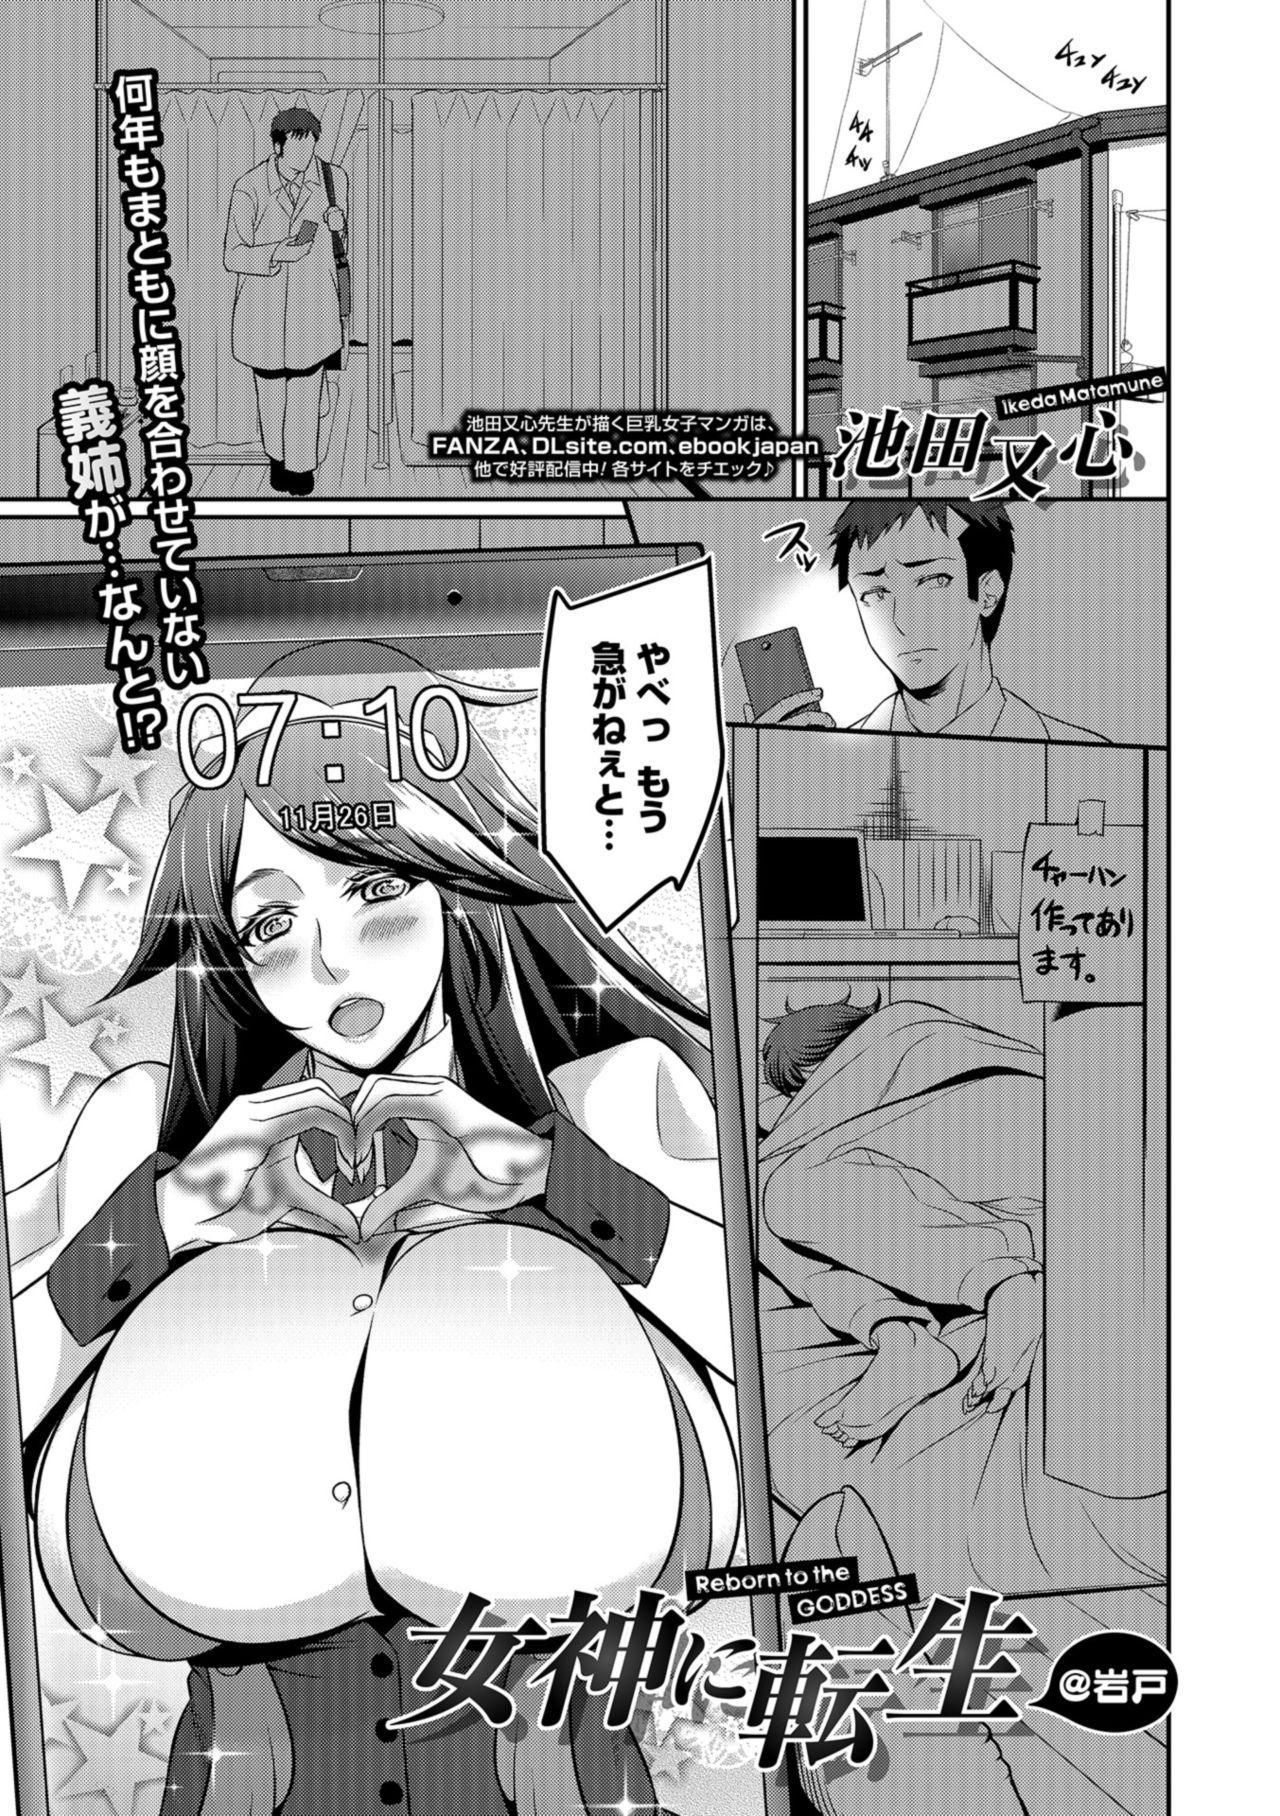 COMIC Shigekiteki SQUIRT!! Vol. 09 214